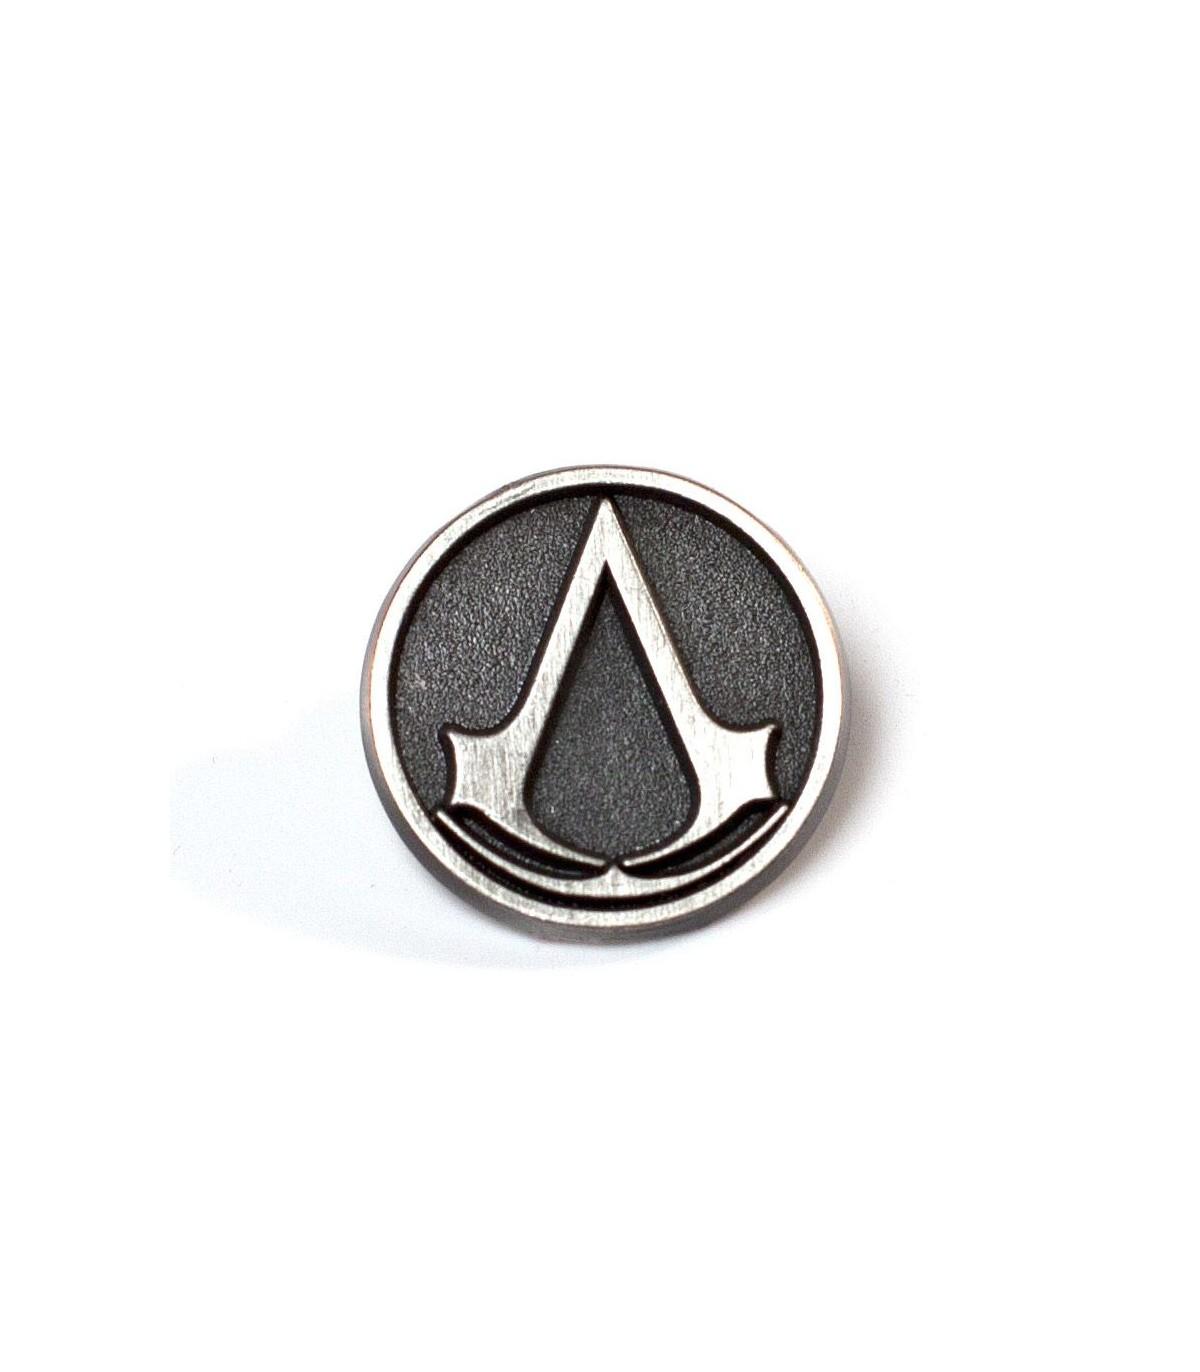 Assassins Creed Brooch Assassins Creed Pins Broches